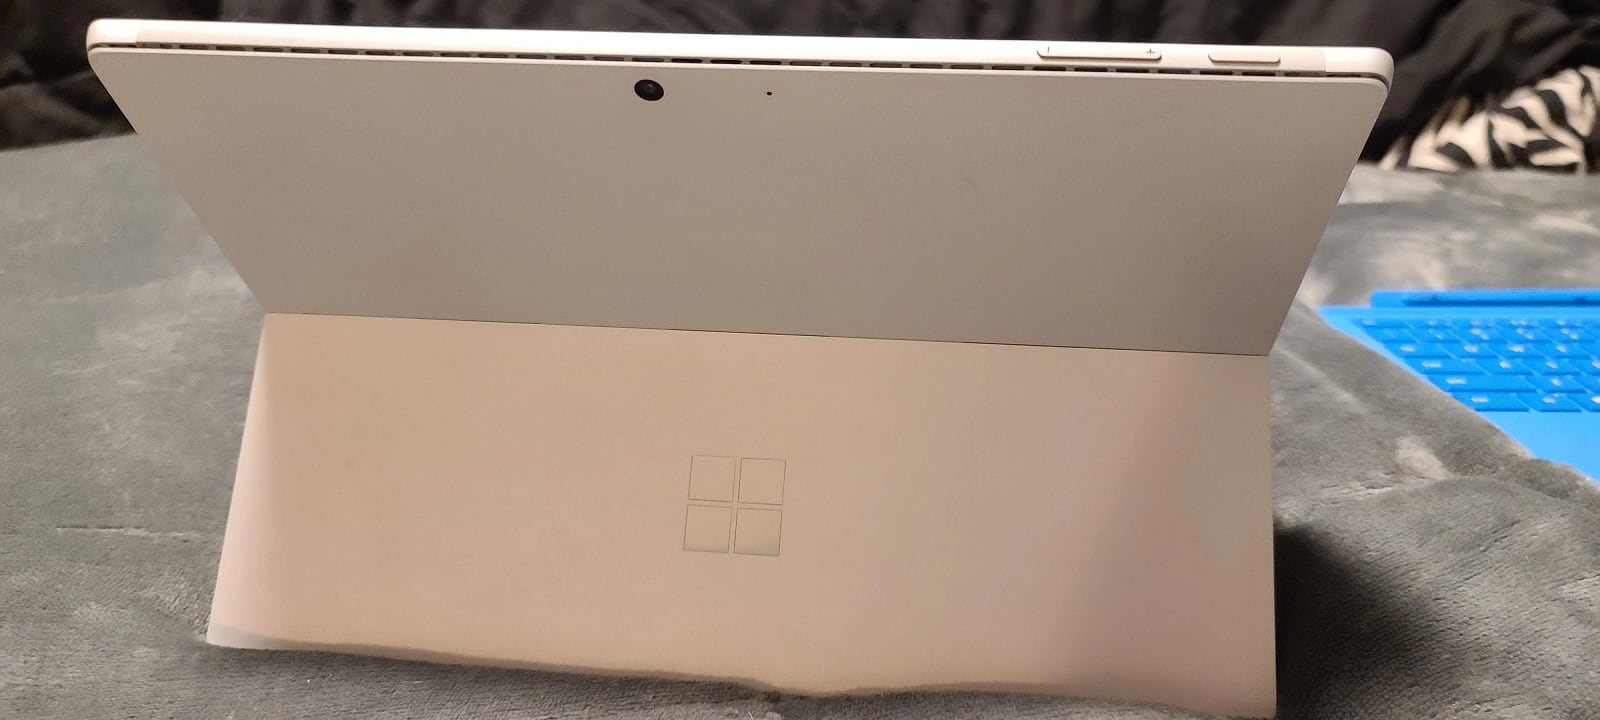 Surface Pro 8 back